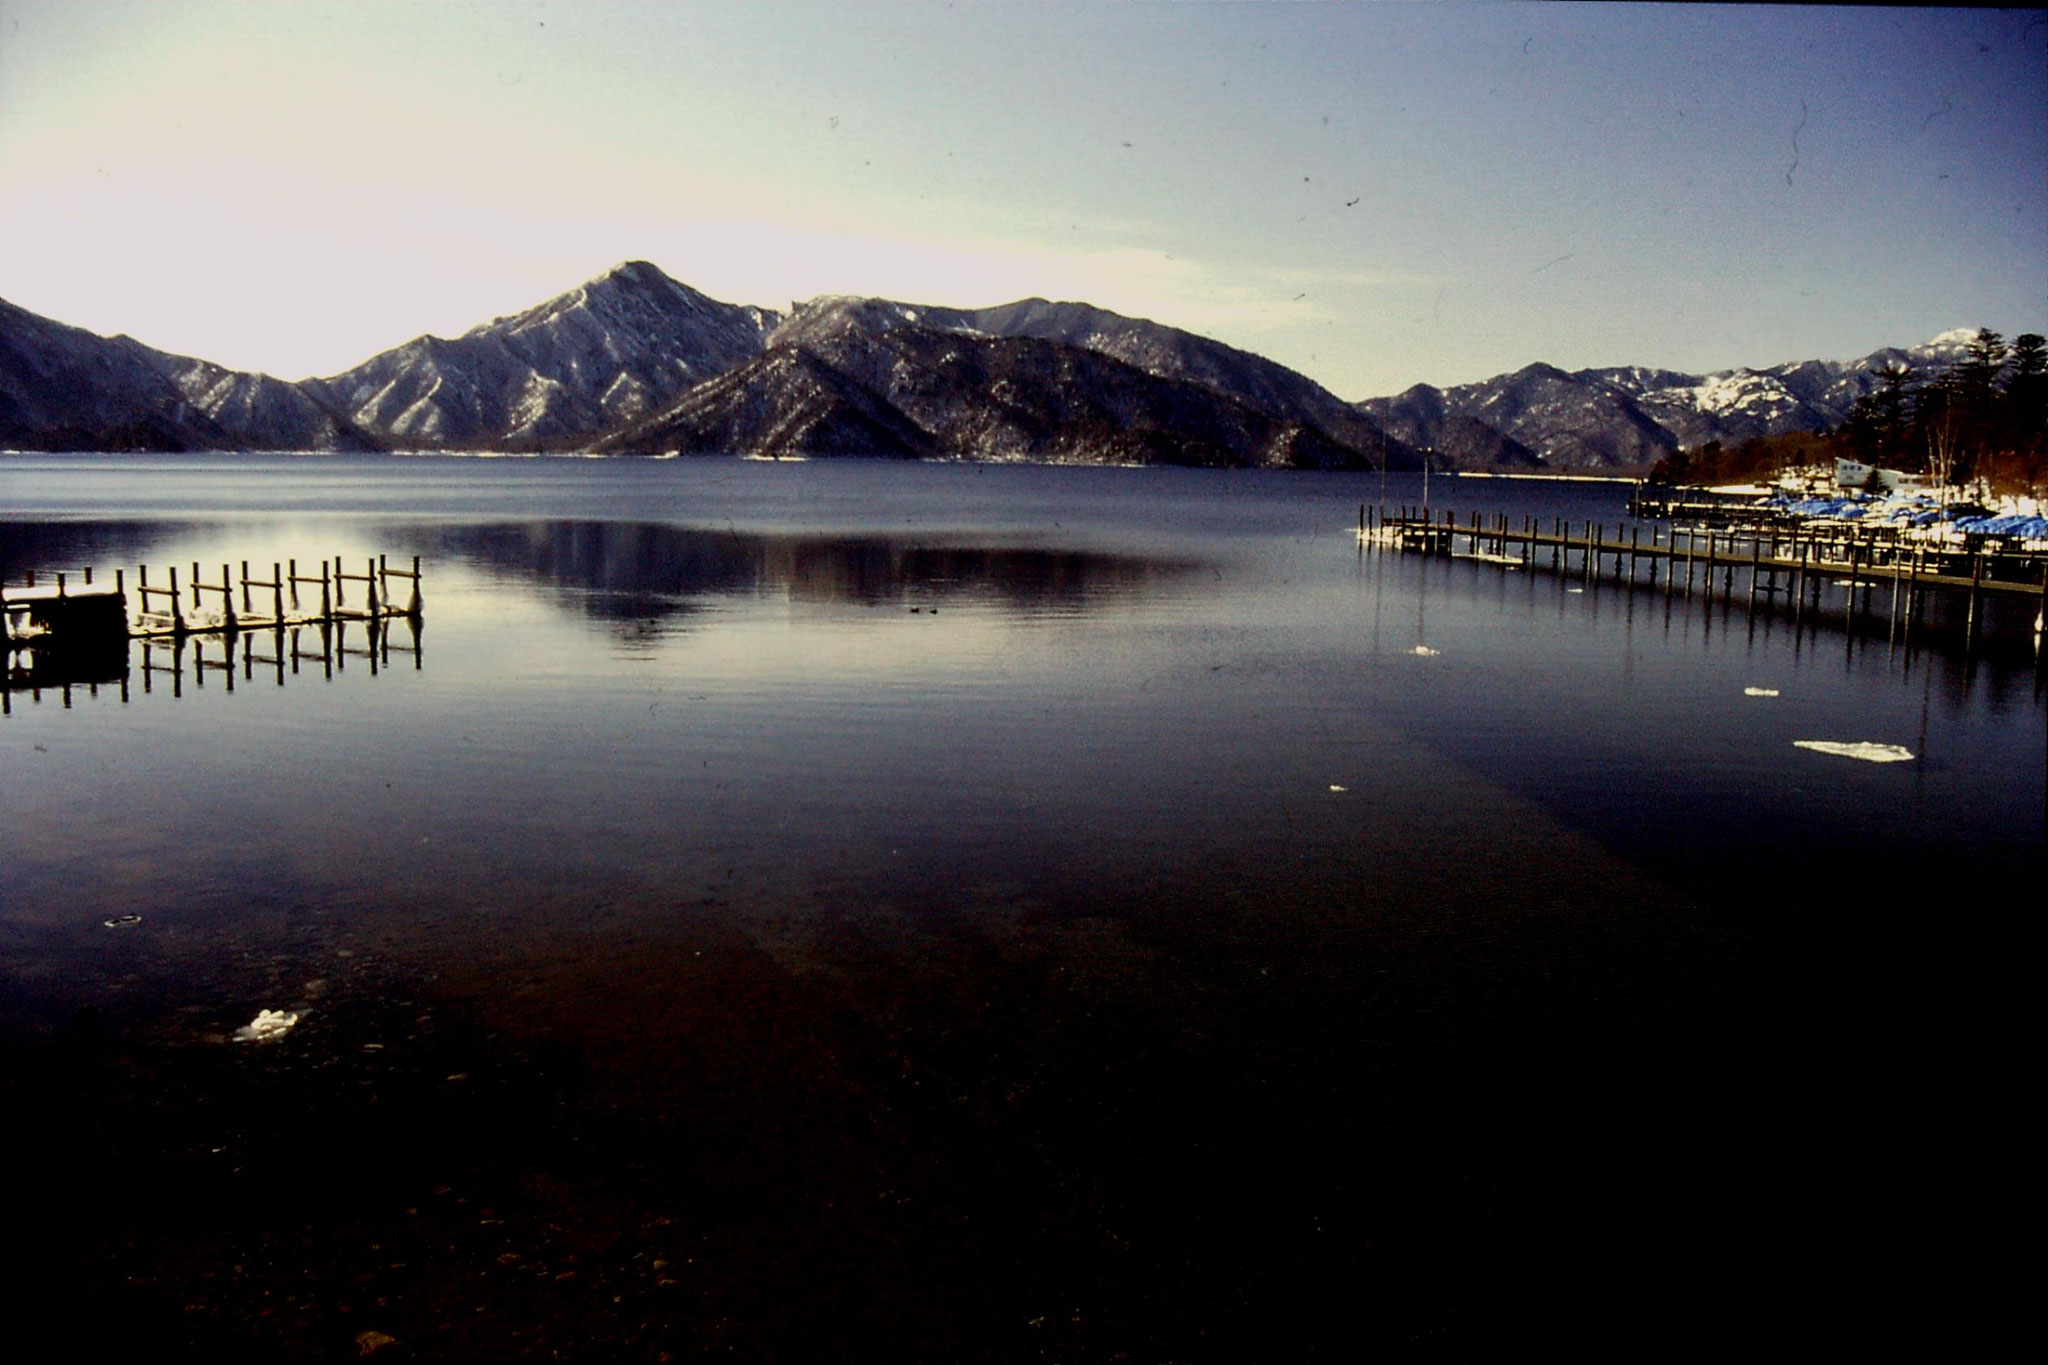 30/1/1989: 8: Lake Chusenji